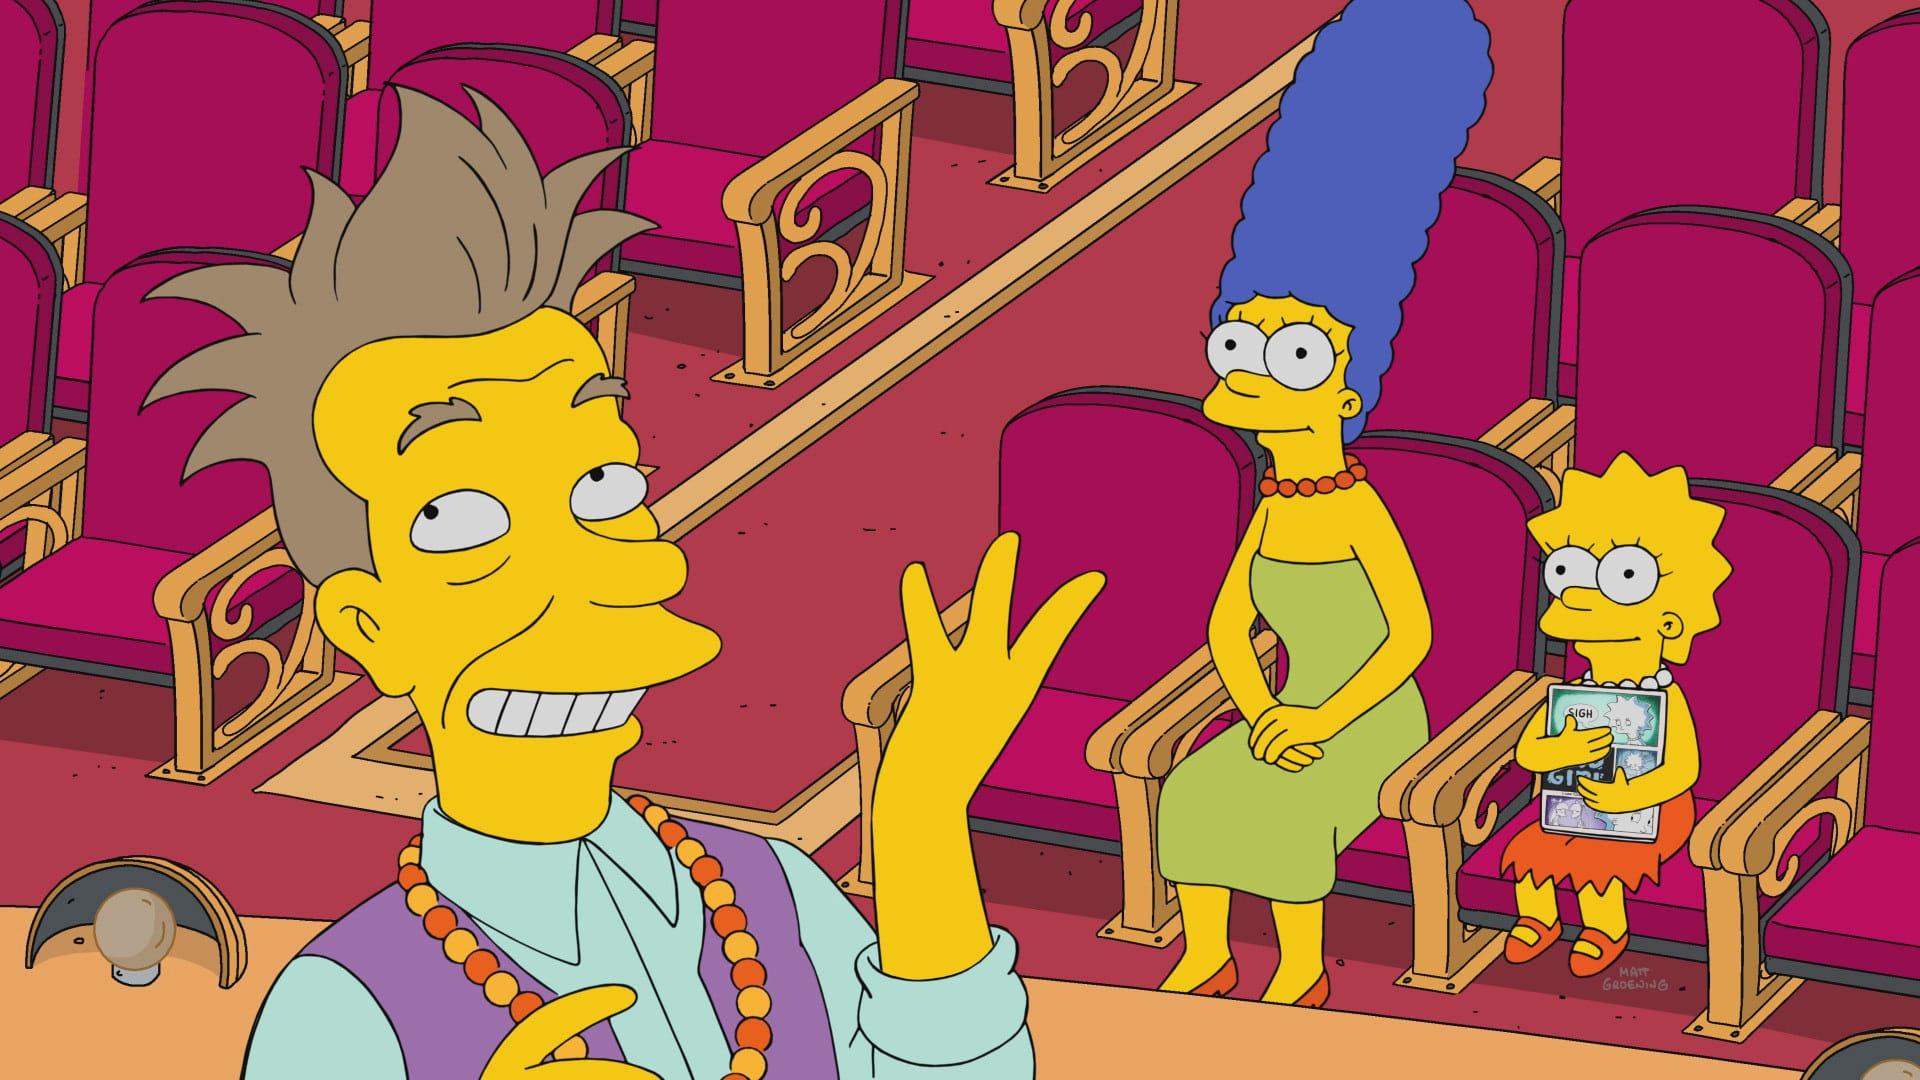 Les Simpson - Springfield Splendor